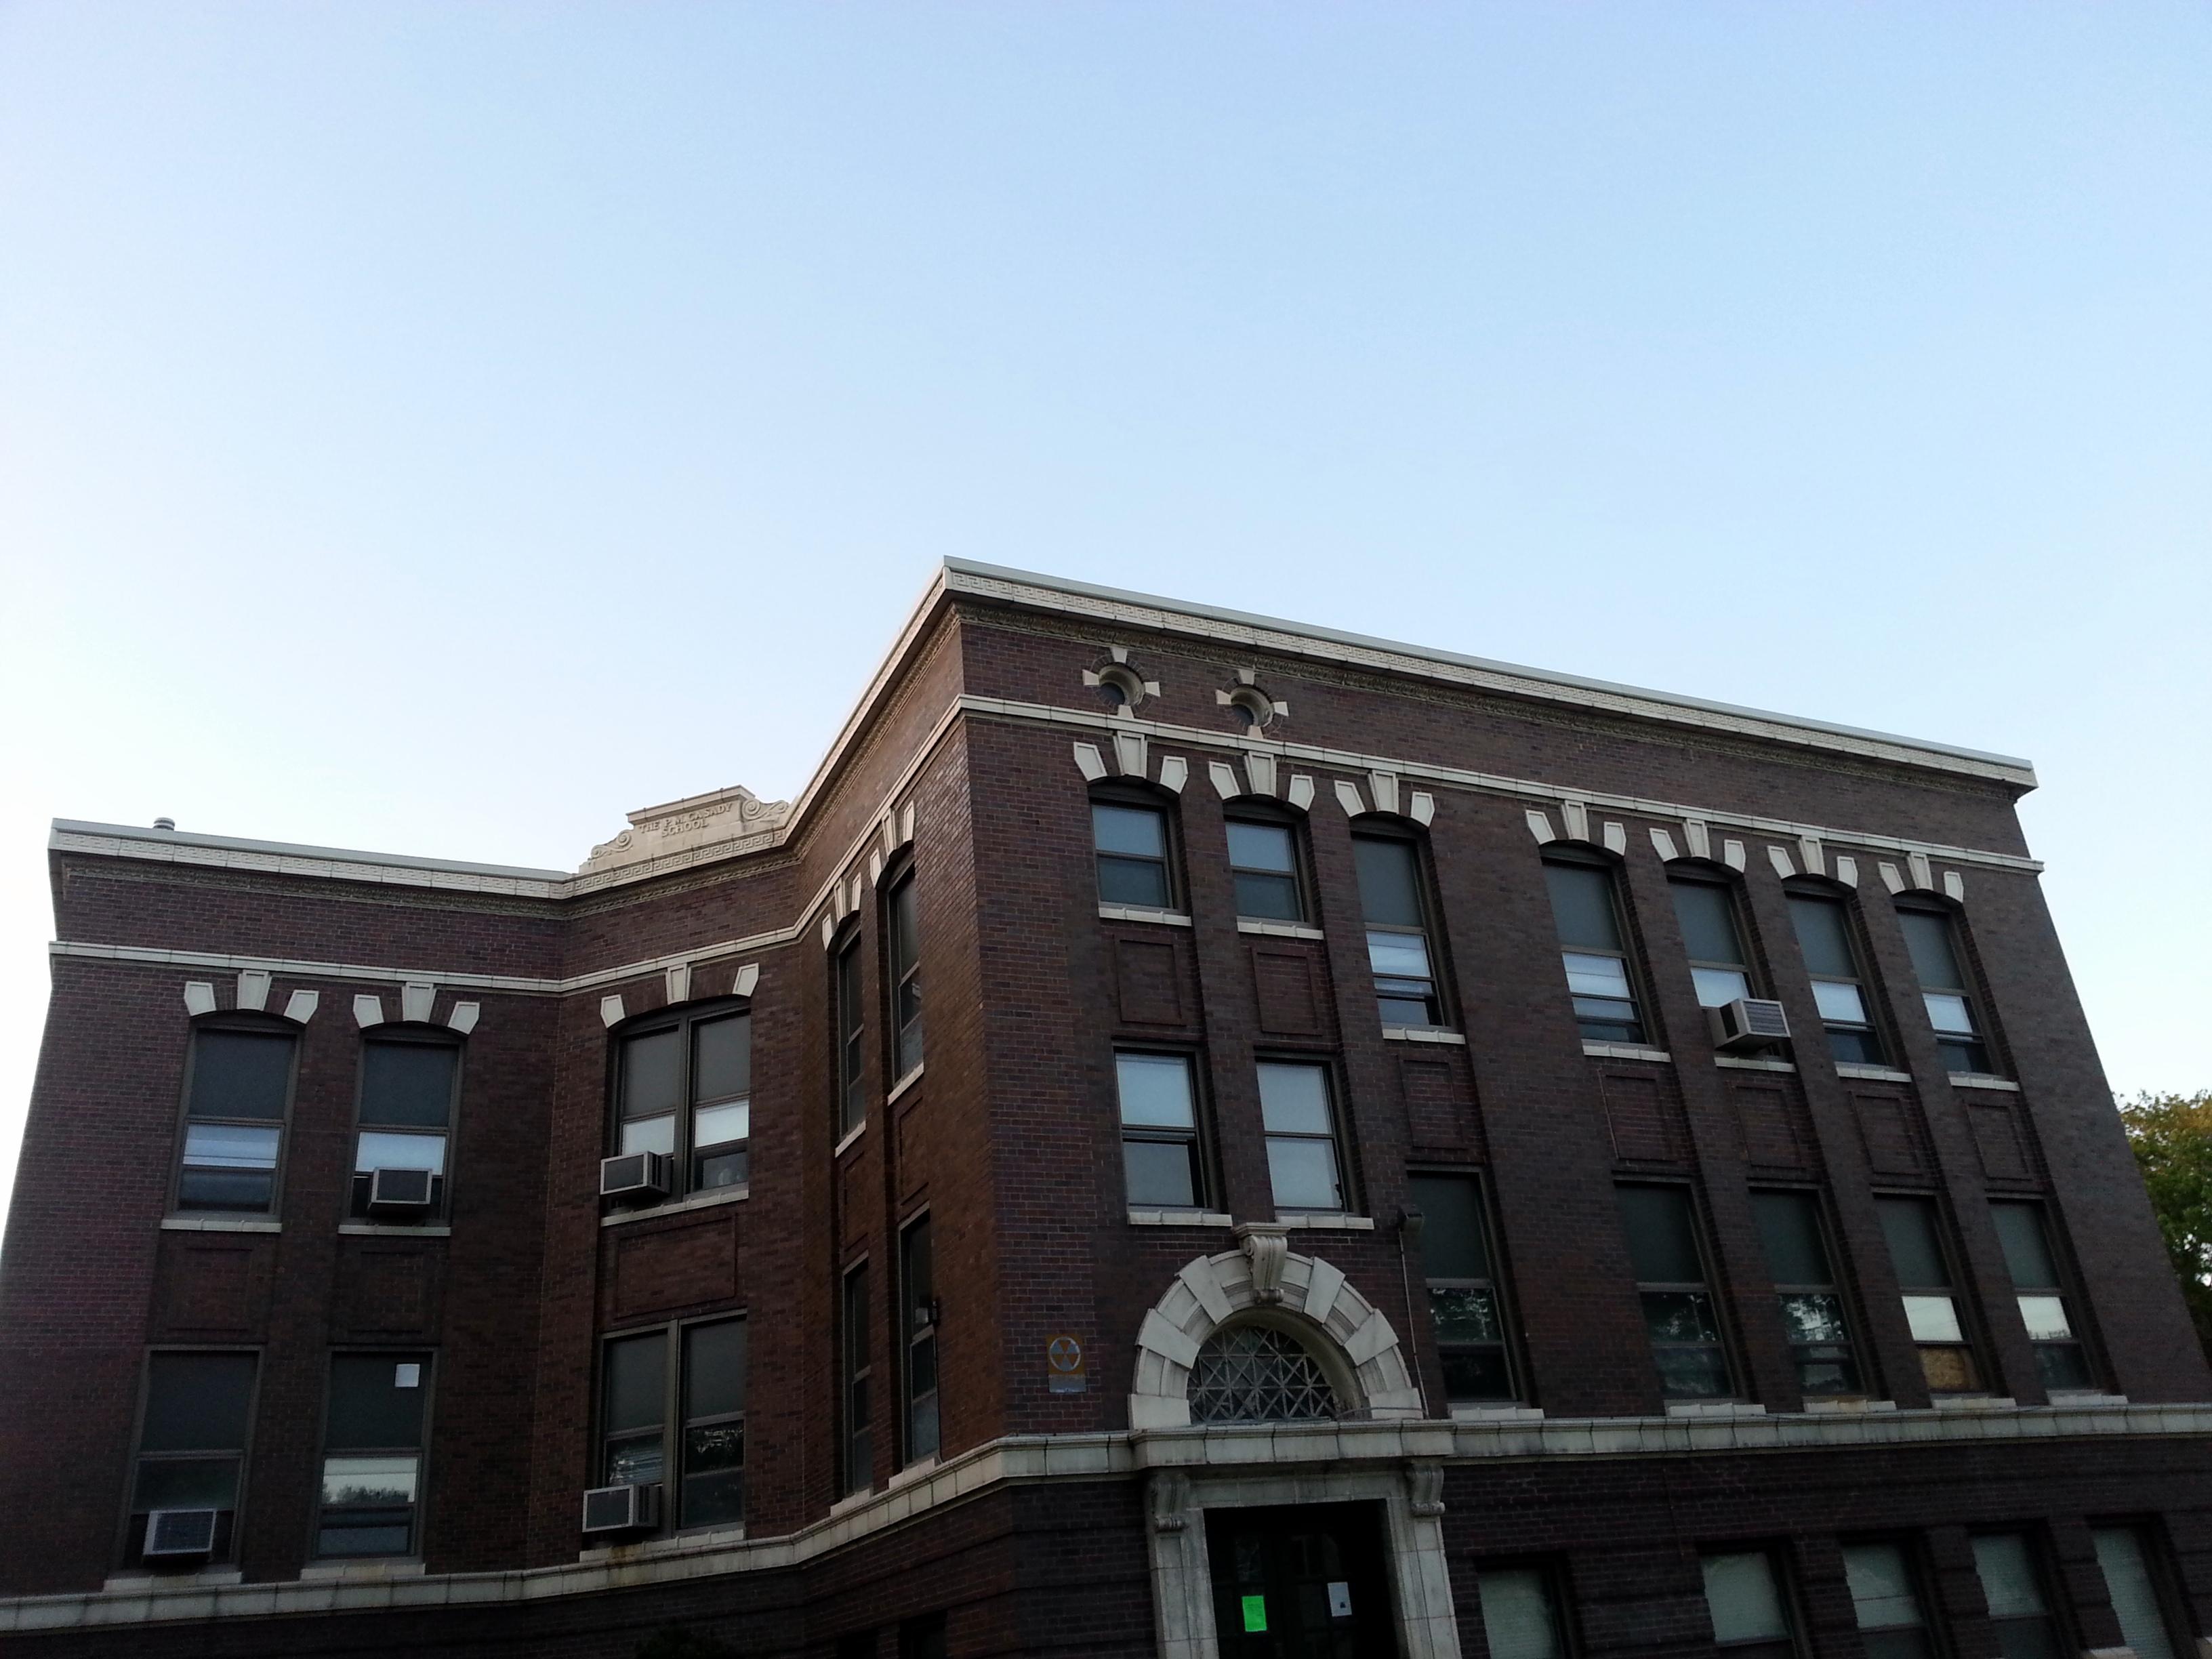 Casady Building 6-12-2013